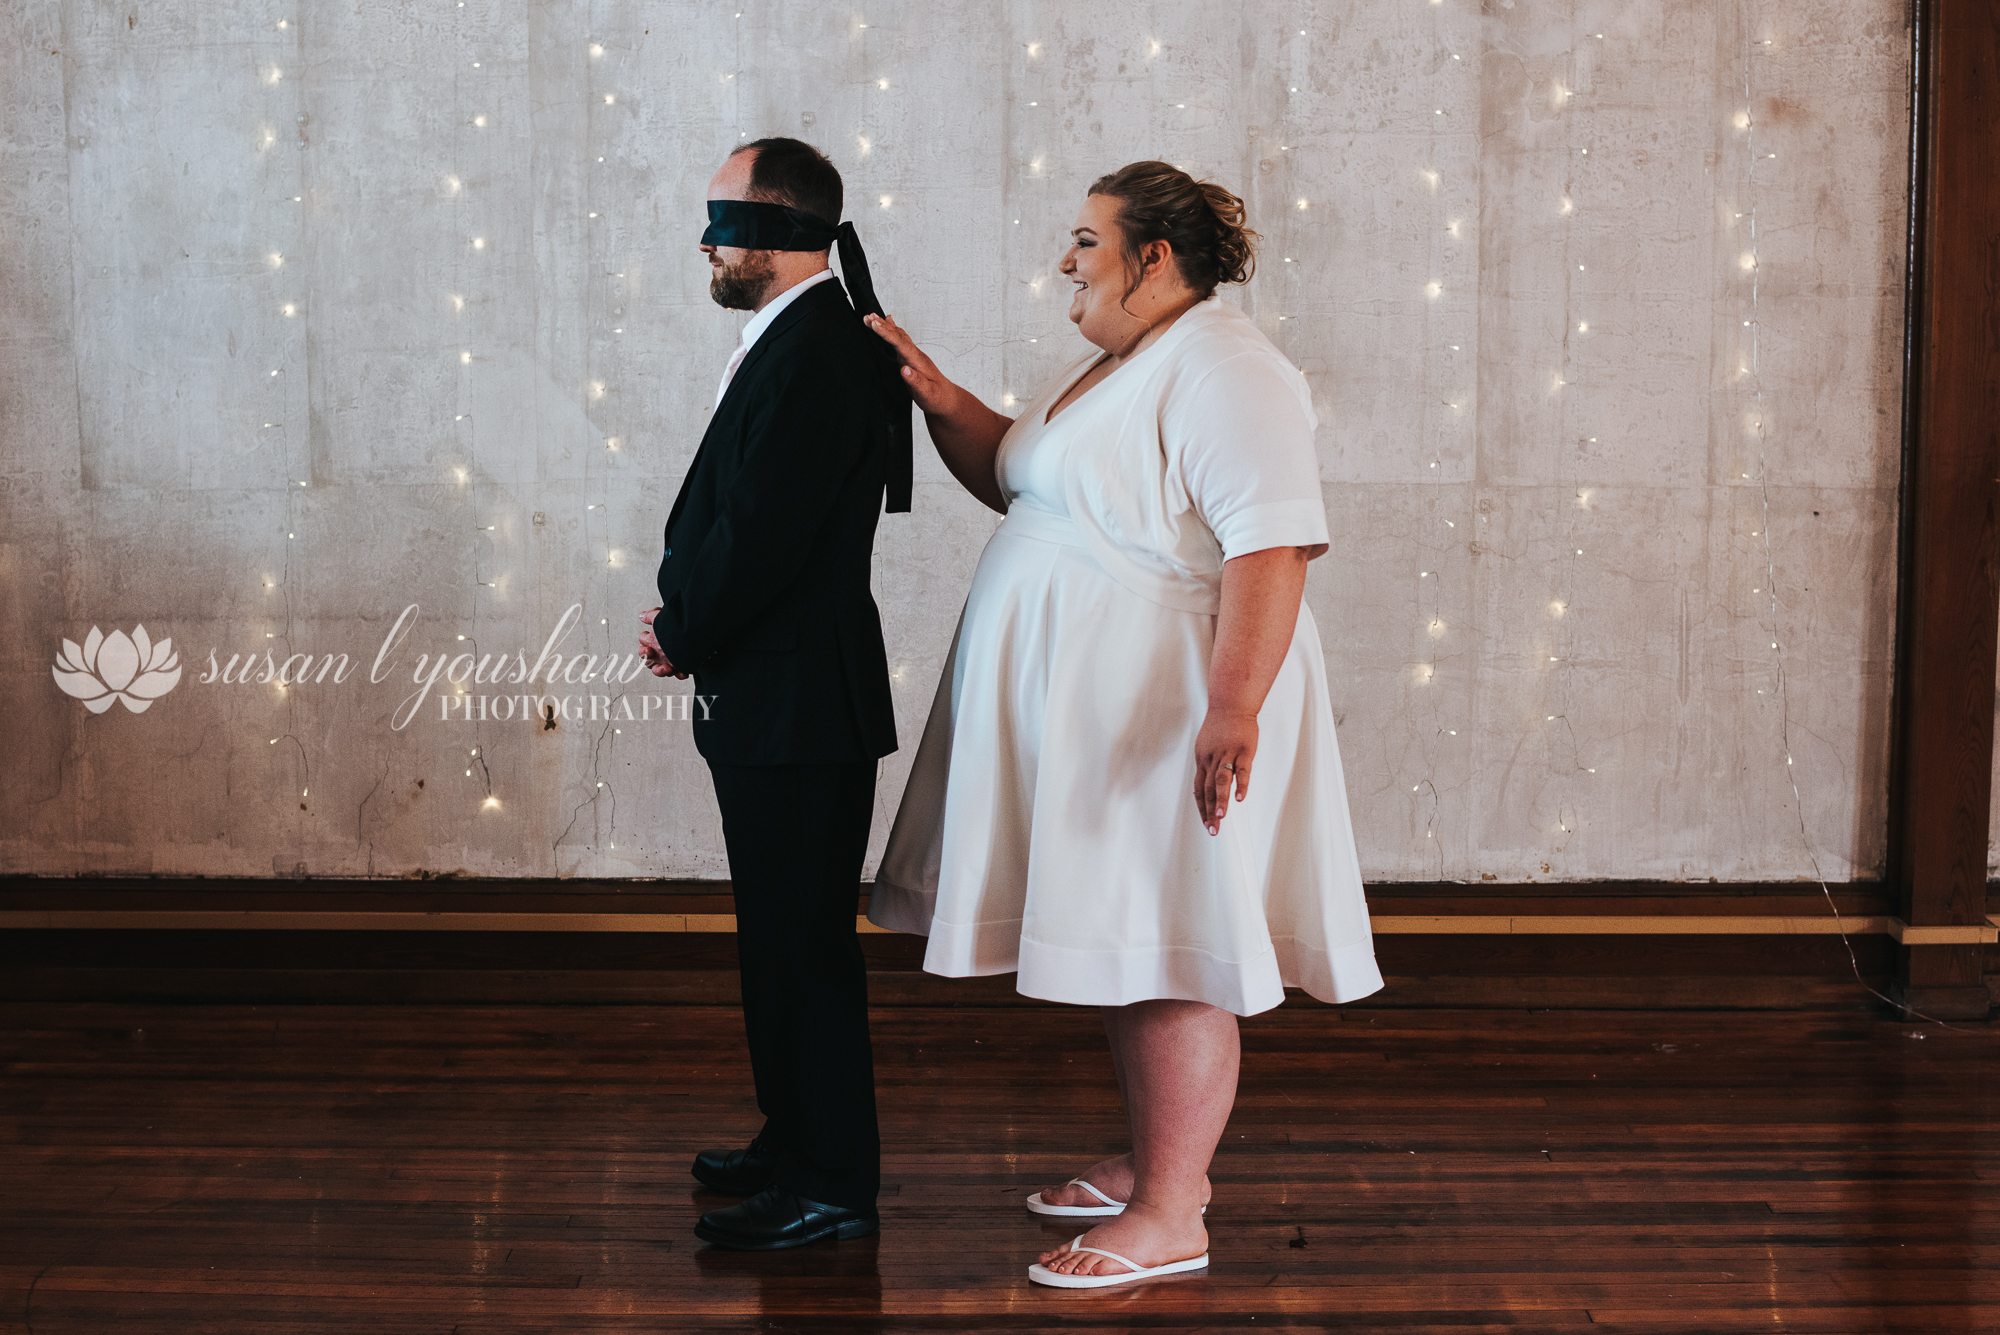 Bill and Sarah Wedding Photos 06-08-2019 SLY Photography -5.jpg